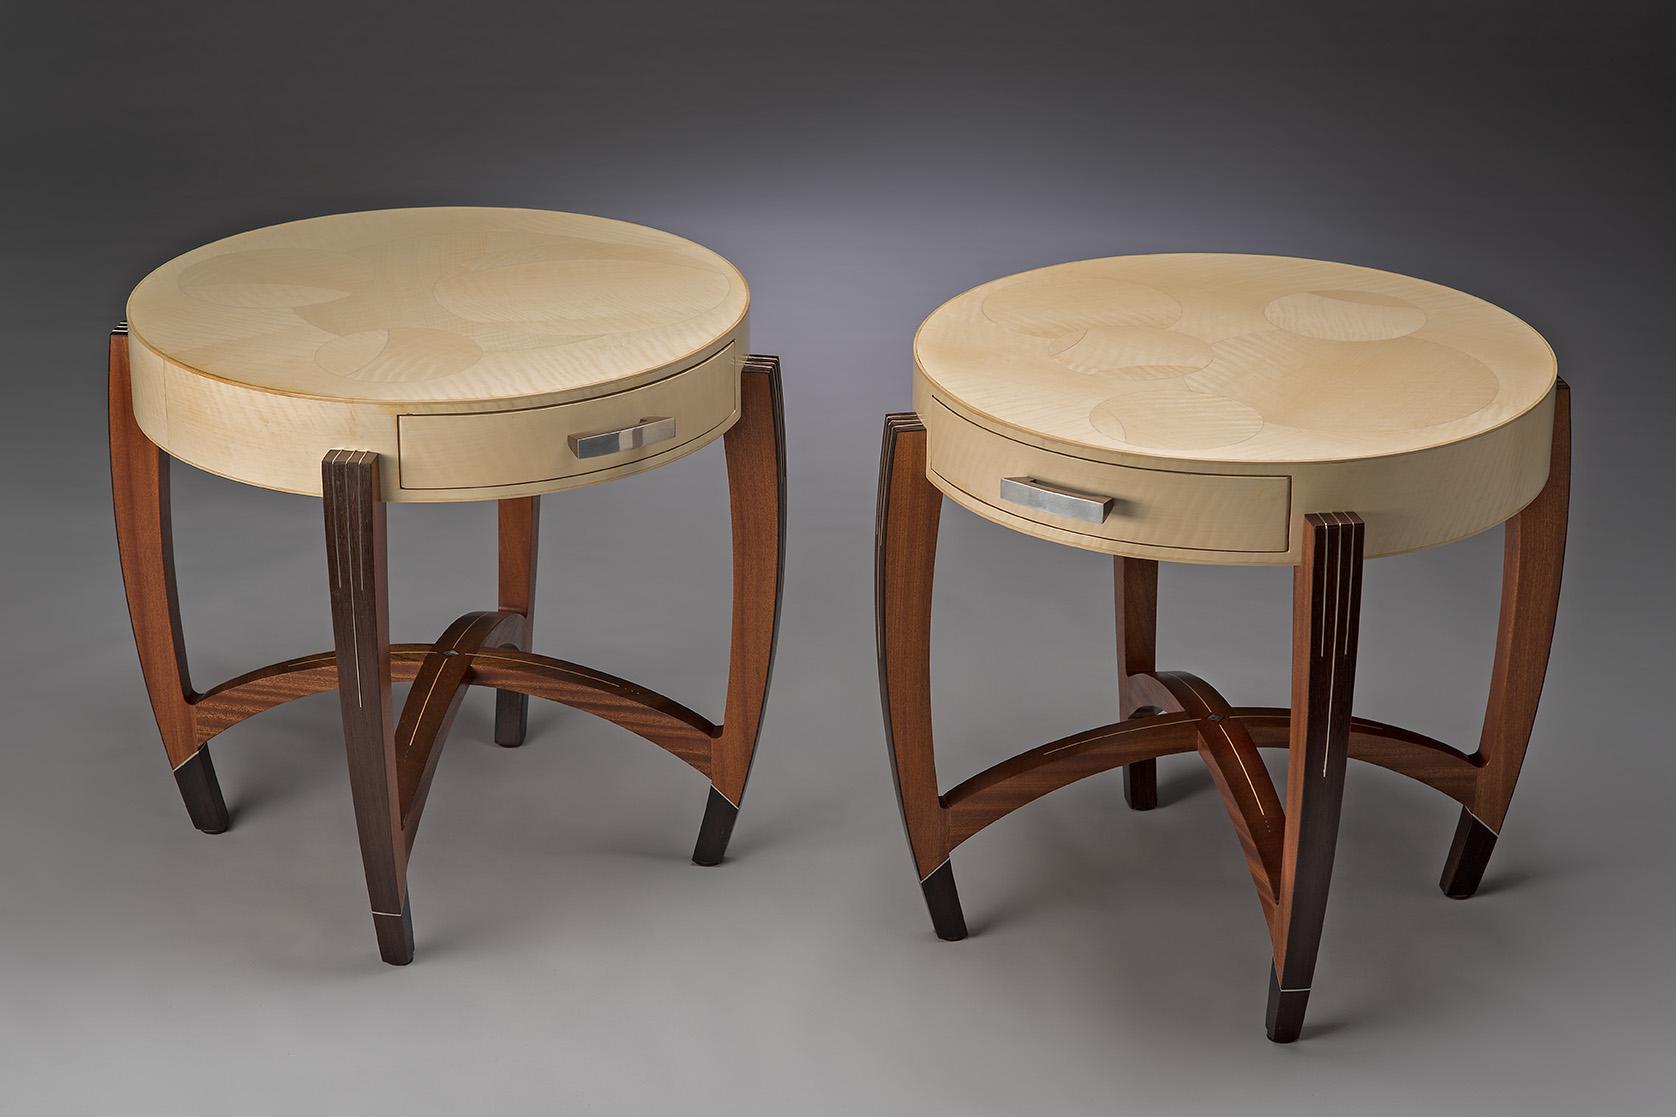 es side tables1 sm.jpg